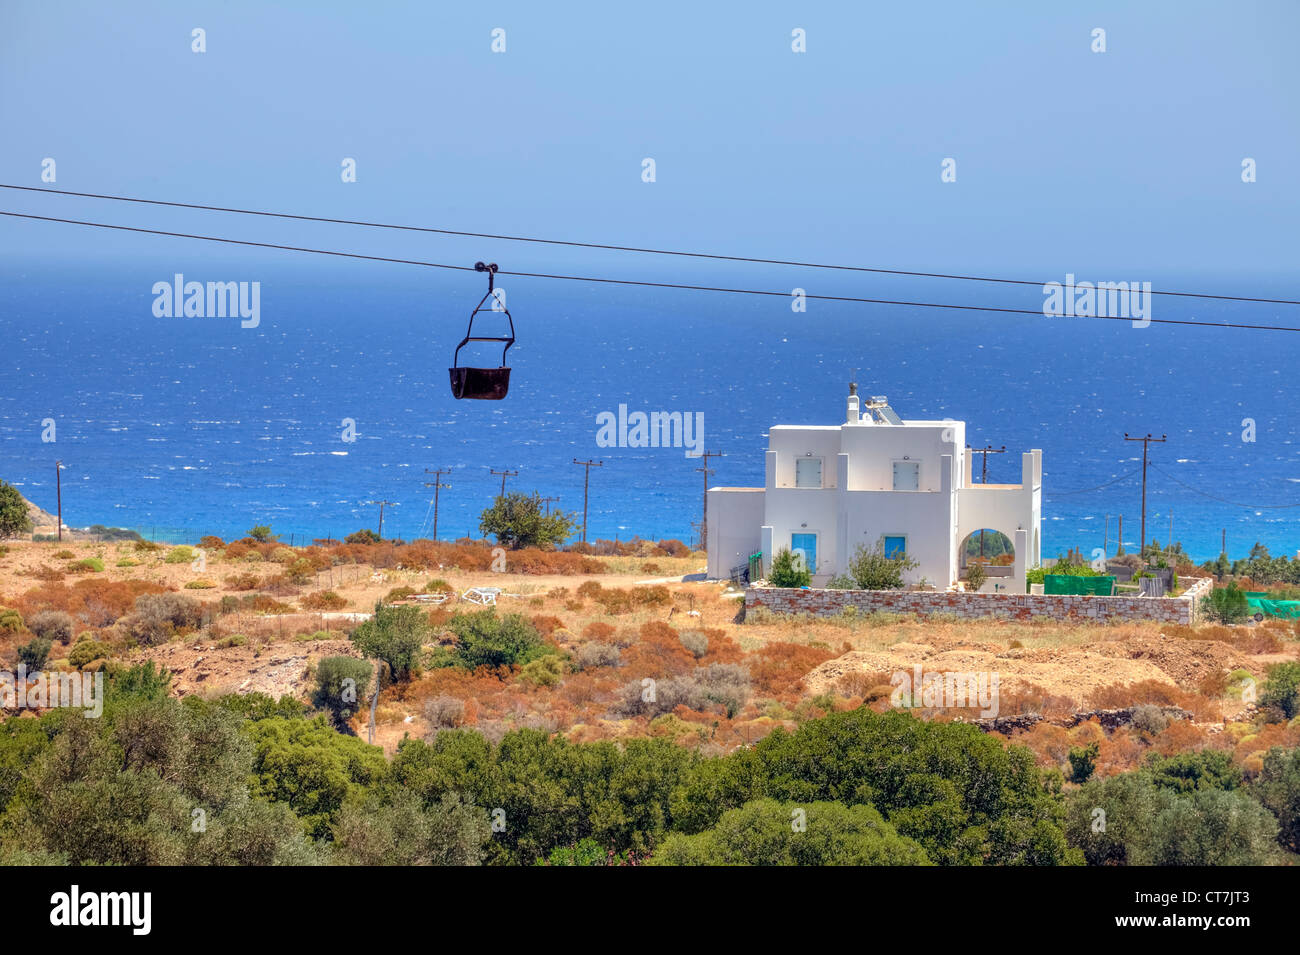 alten Überlieferungen der Schmirgel-Extraktion bei Moutsouna, Naxos, Griechenland Stockbild